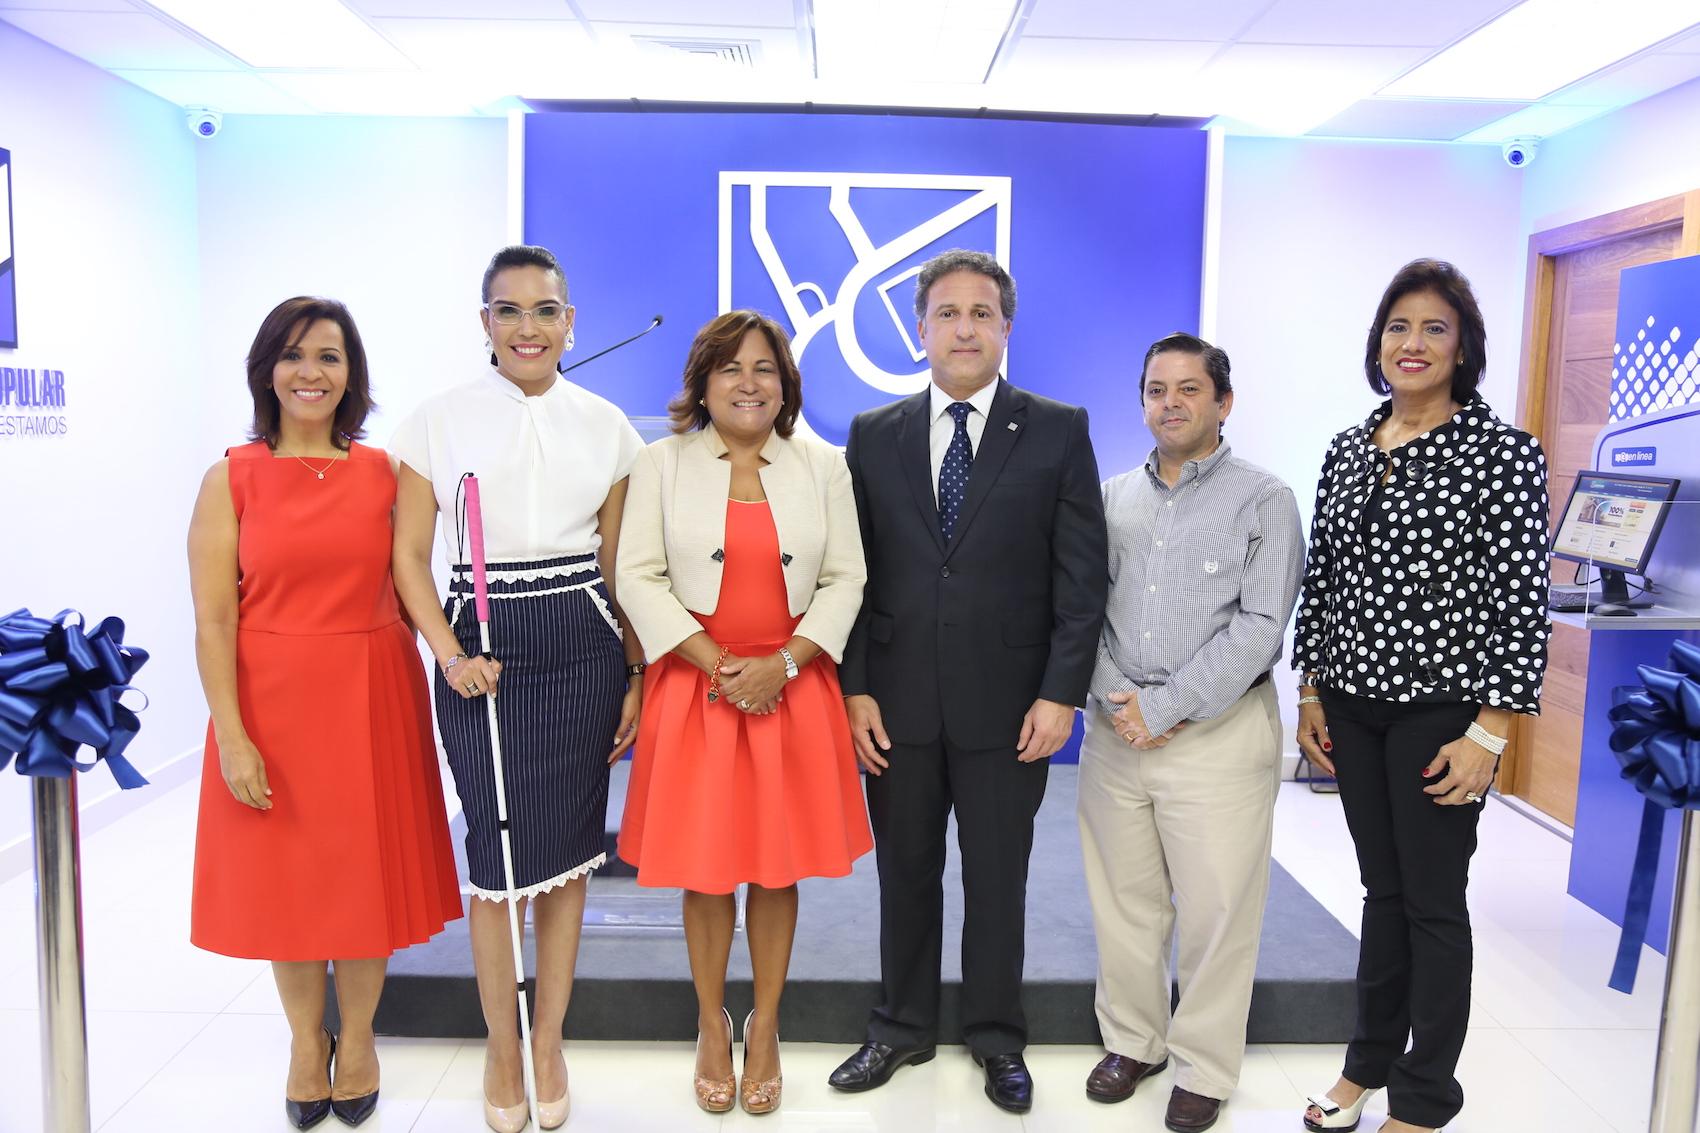 Mildred Minaya, Francina Hungría, Nurys Marte, Gustavo Ariza, Tommy Guzmán e Ivette Bermúdez.